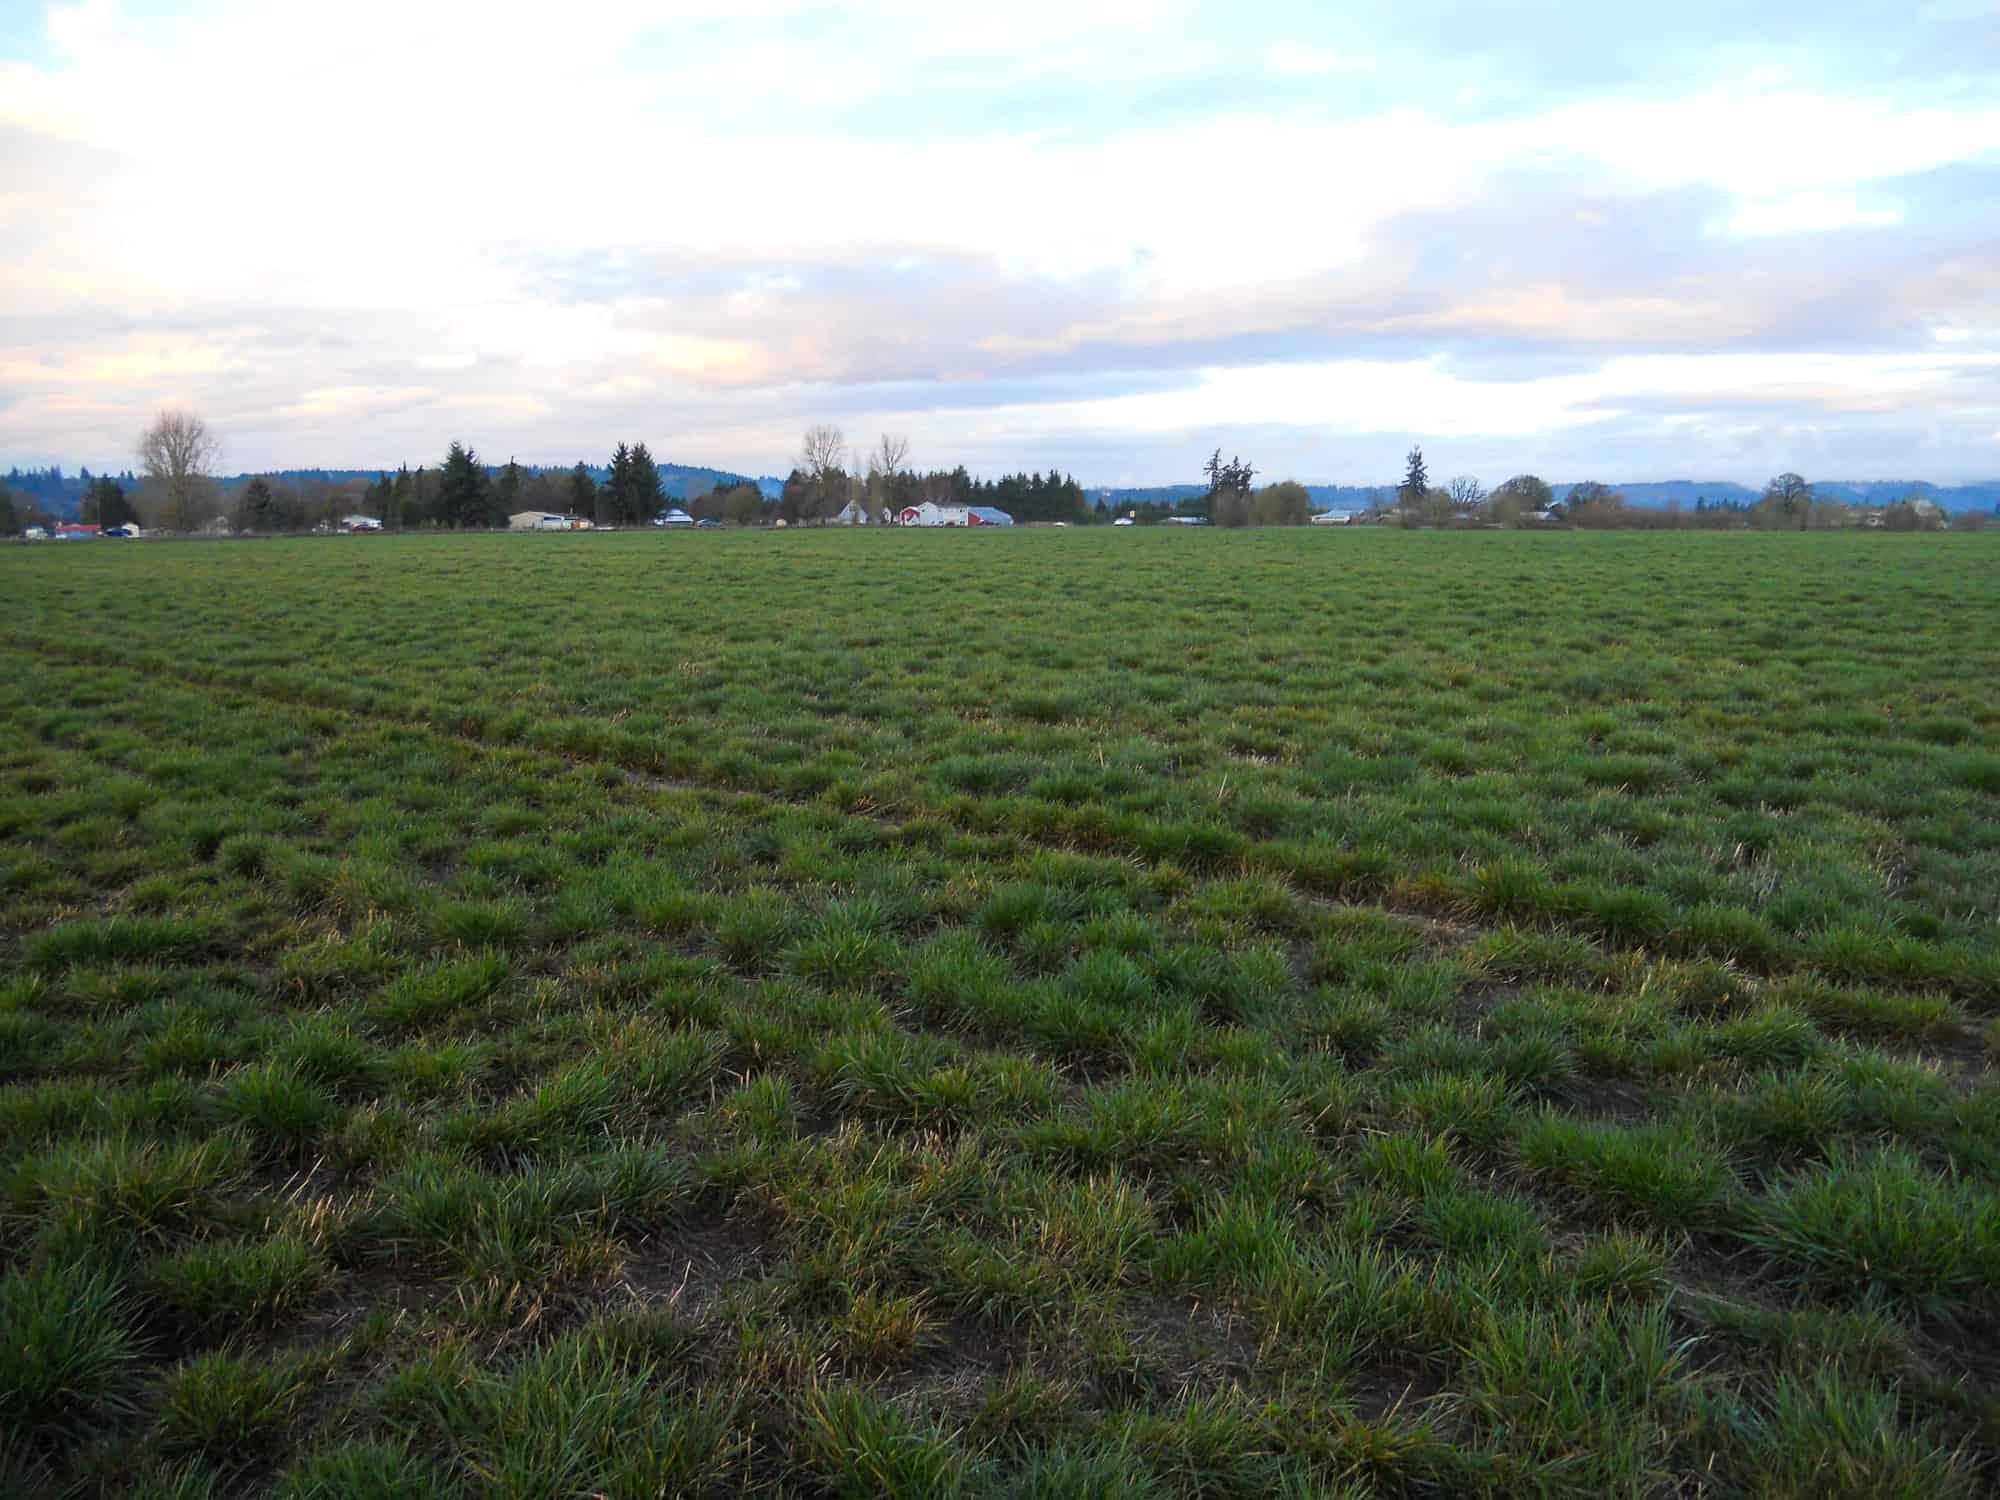 Crabtree Farm Property Oregon Farm Property For Sale